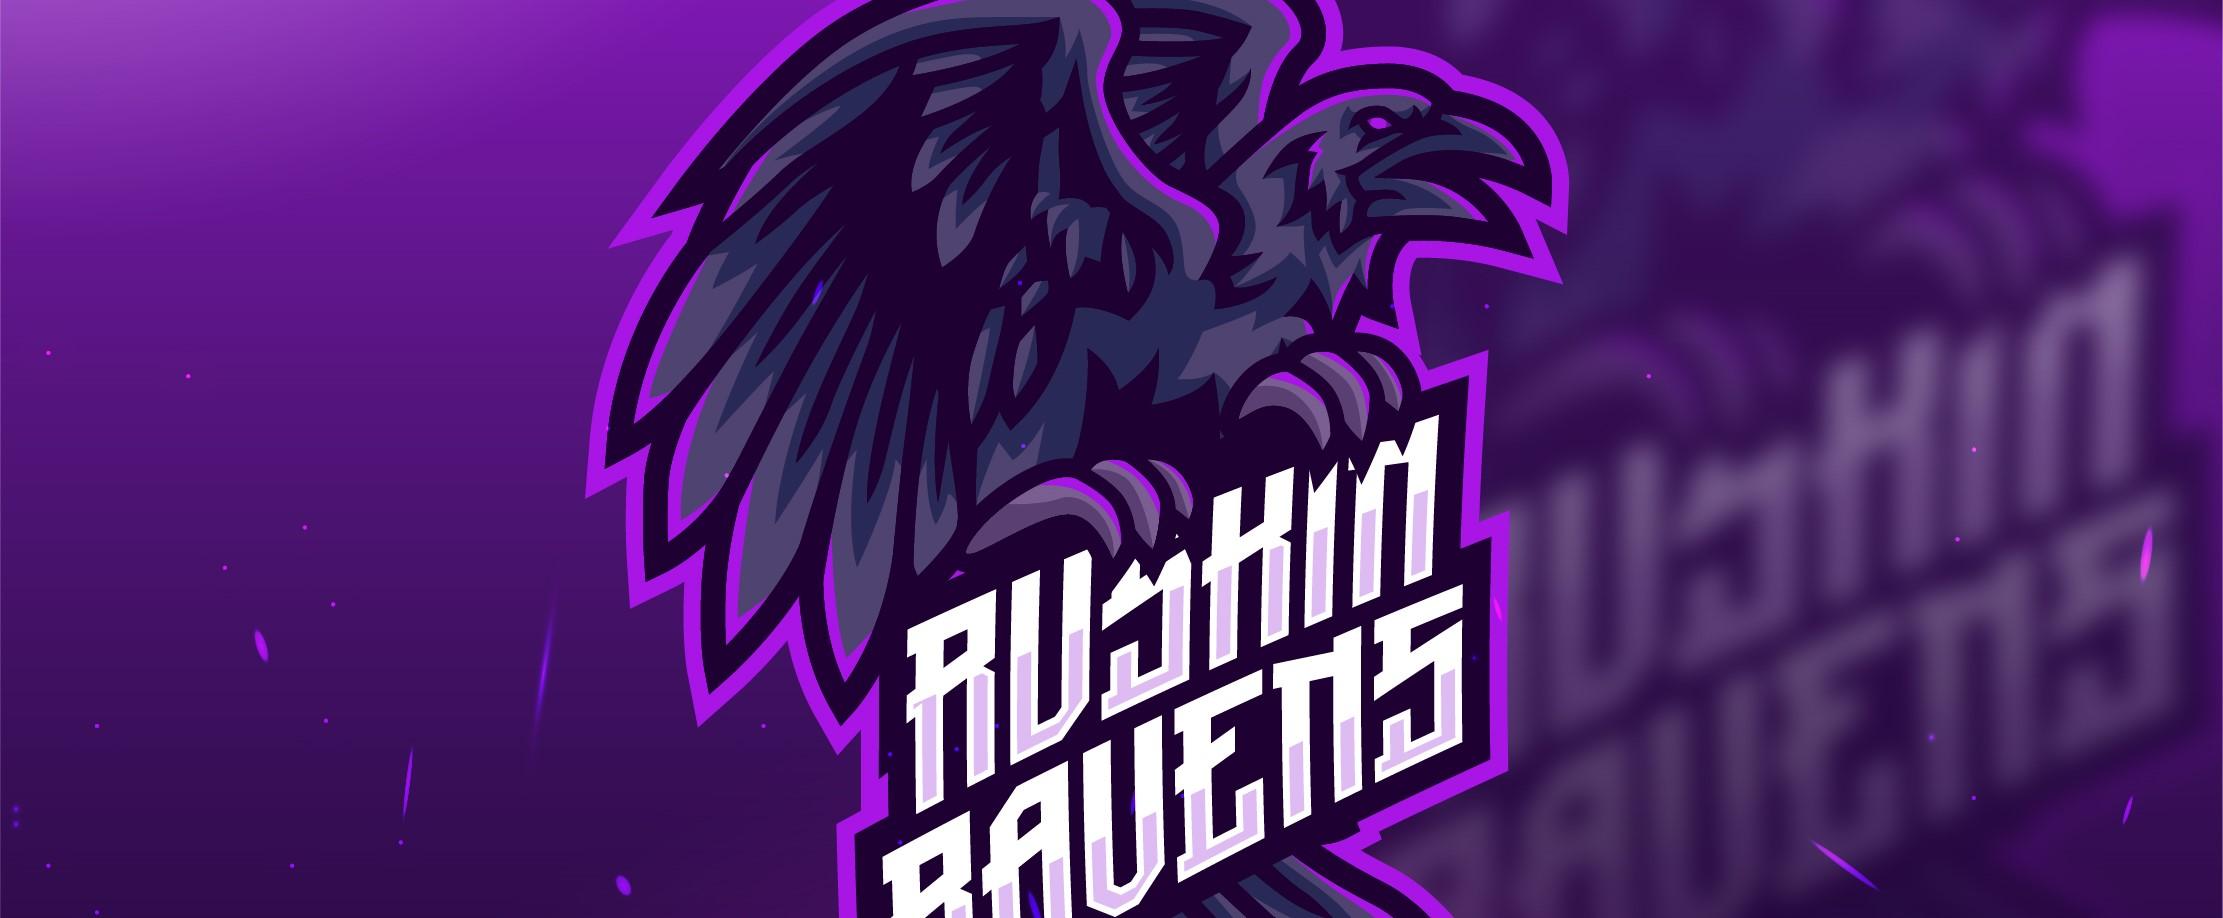 Background ARU Esports (Ruskin Ravens)